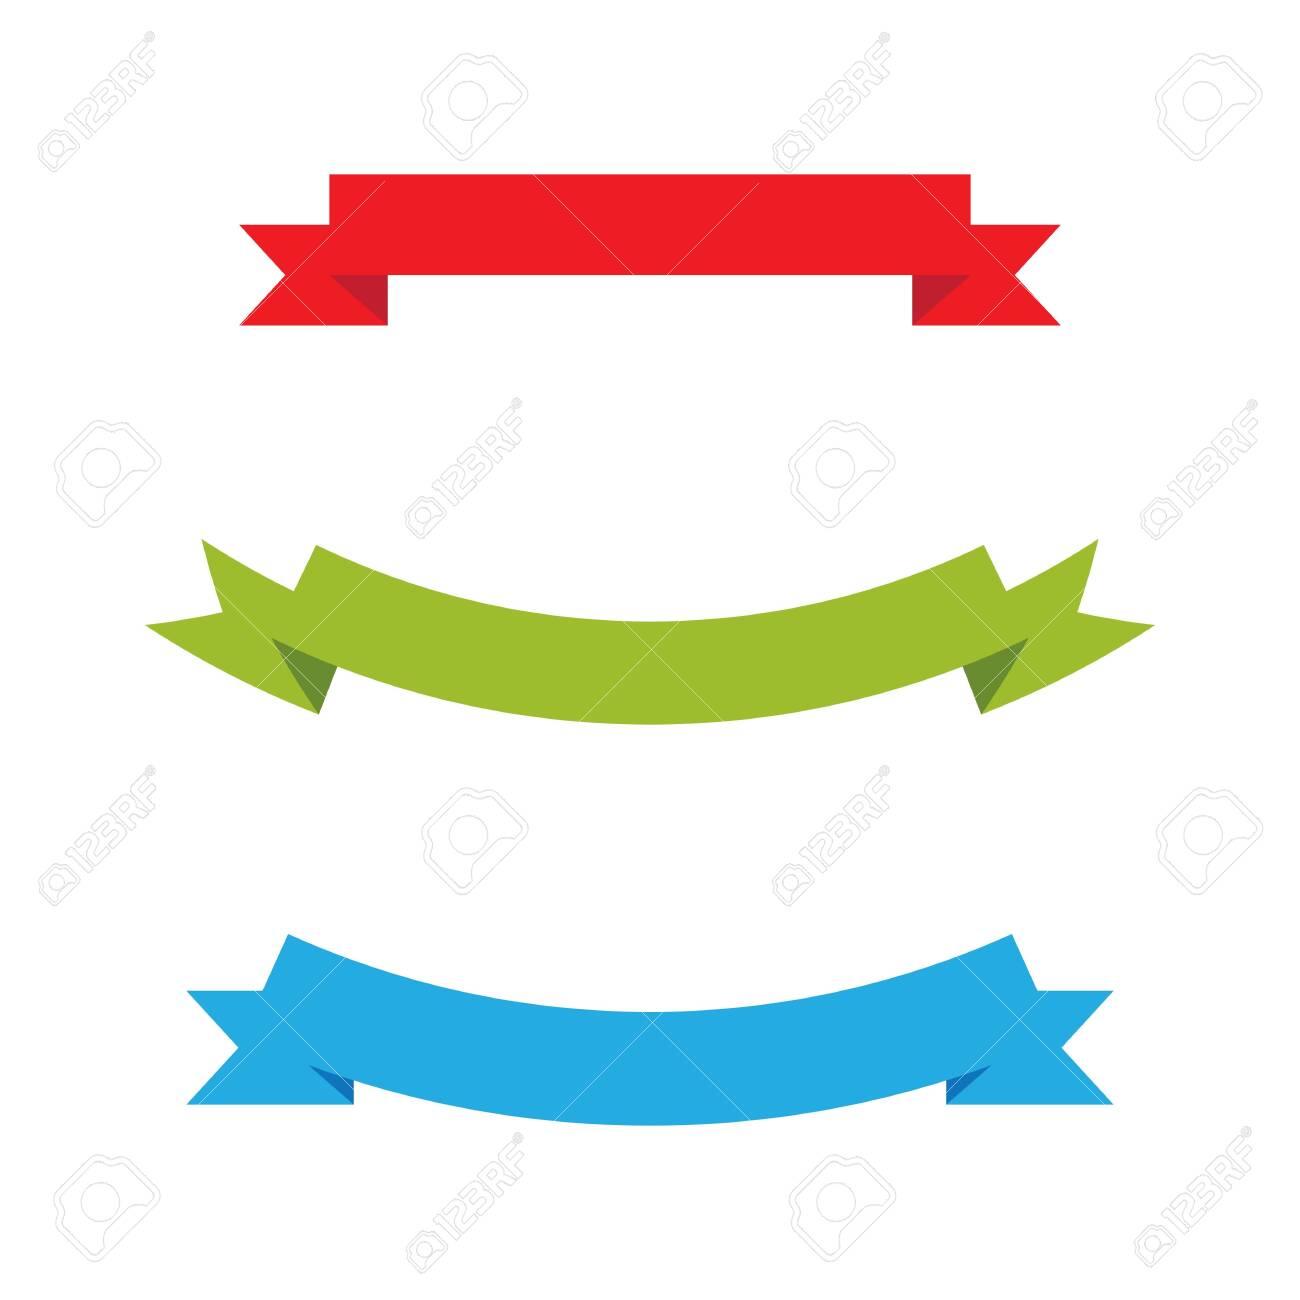 Ribbon banner Vector illustration design template - 128259405